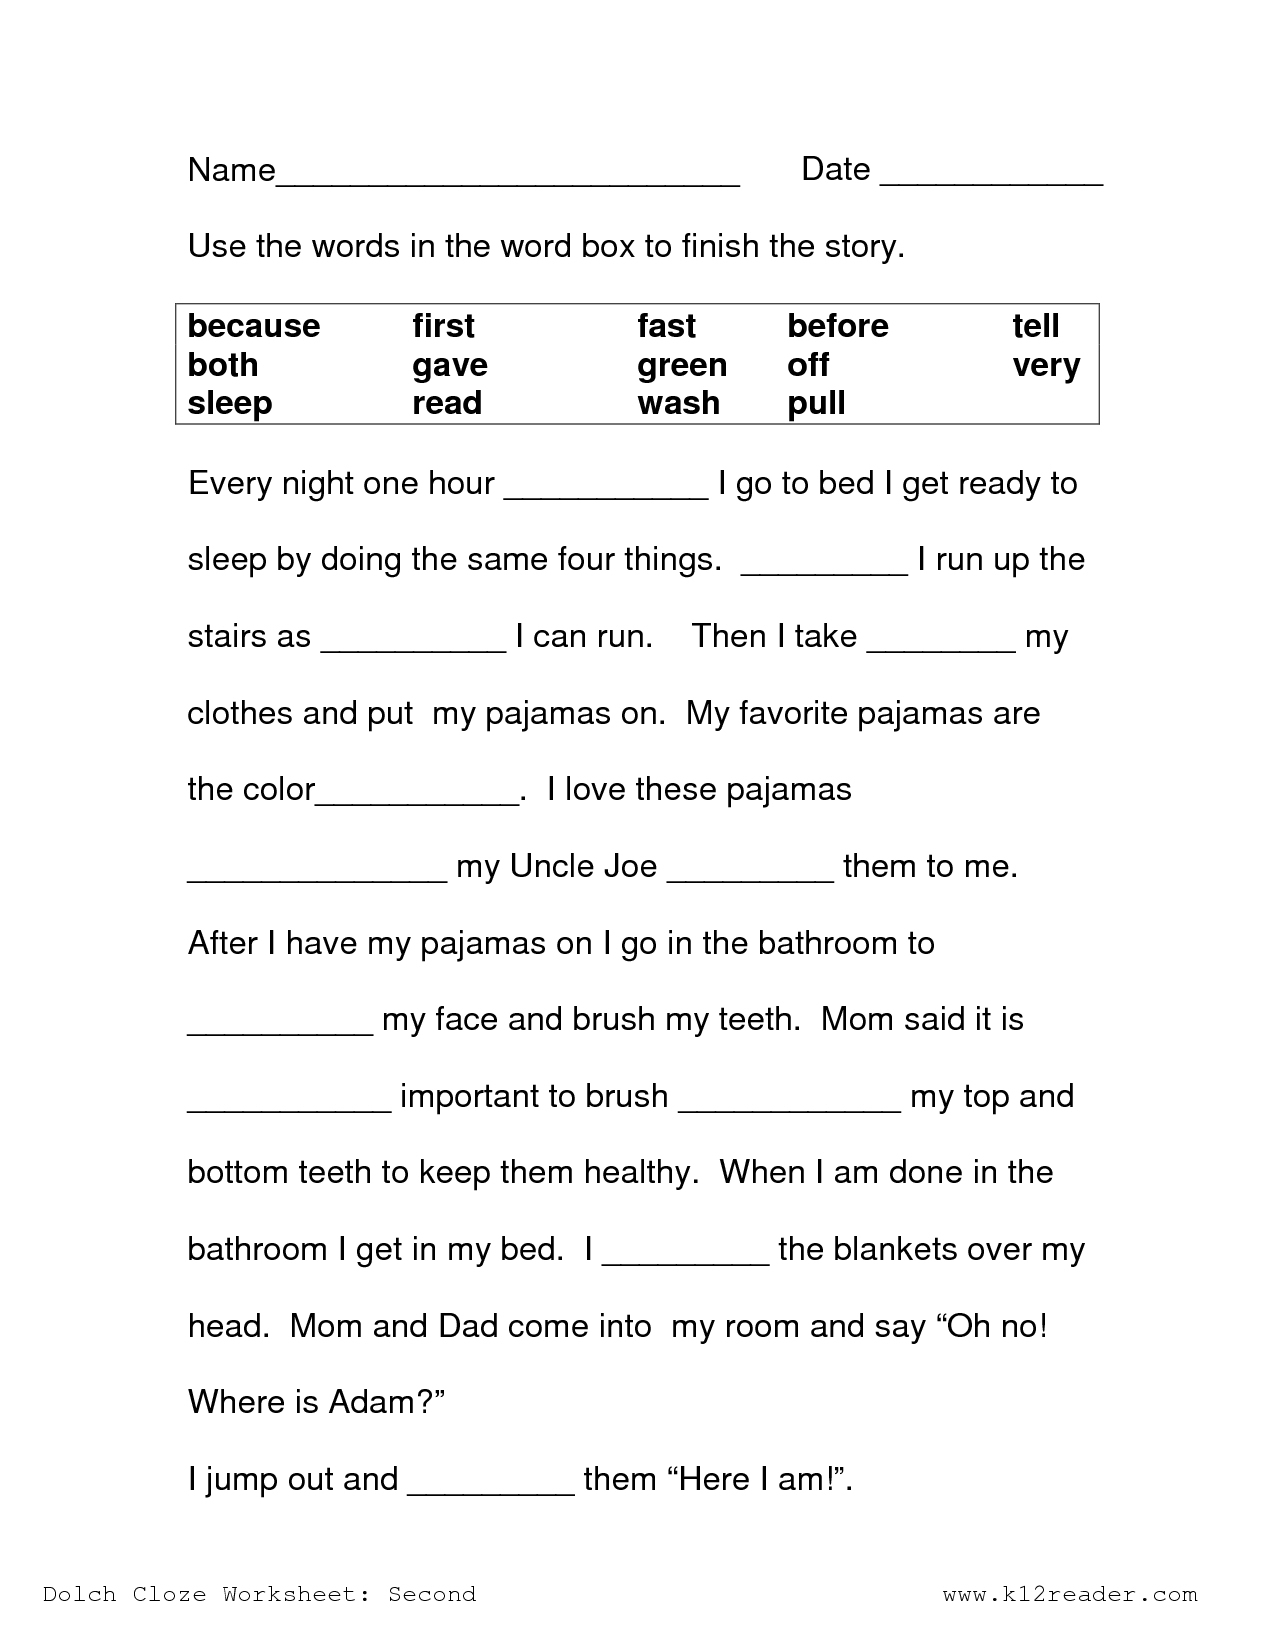 Free Printable Reading Comprehension Worksheets 3Rd Grade To Print - Third Grade Reading Worksheets Free Printable